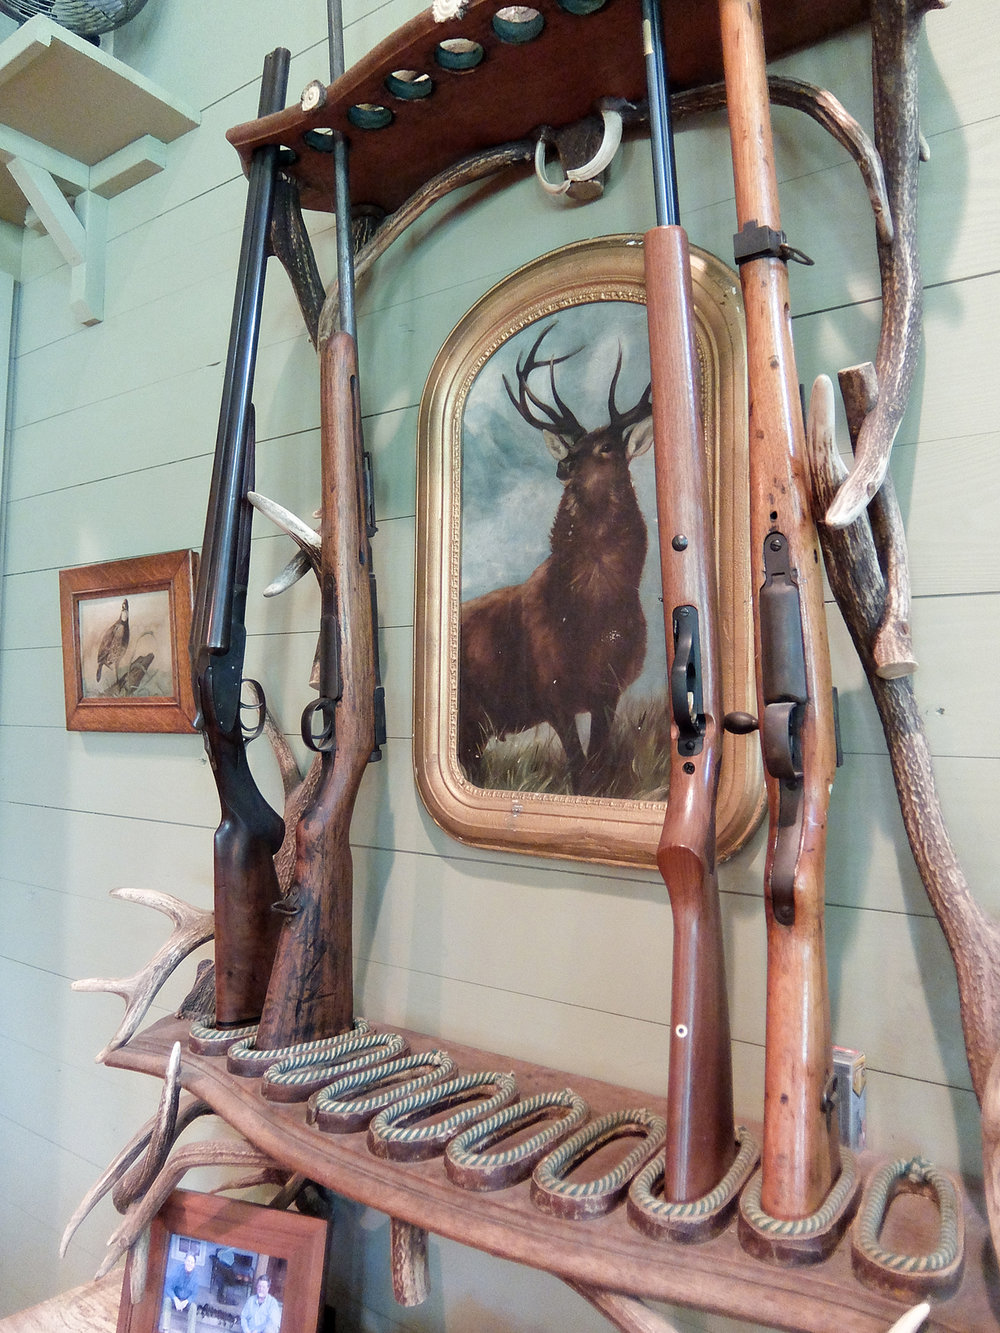 sugar_creek_farm_25_lakehouse_lake_house_den_gun_rack_farmhouse_wood_paneling_1500.jpg